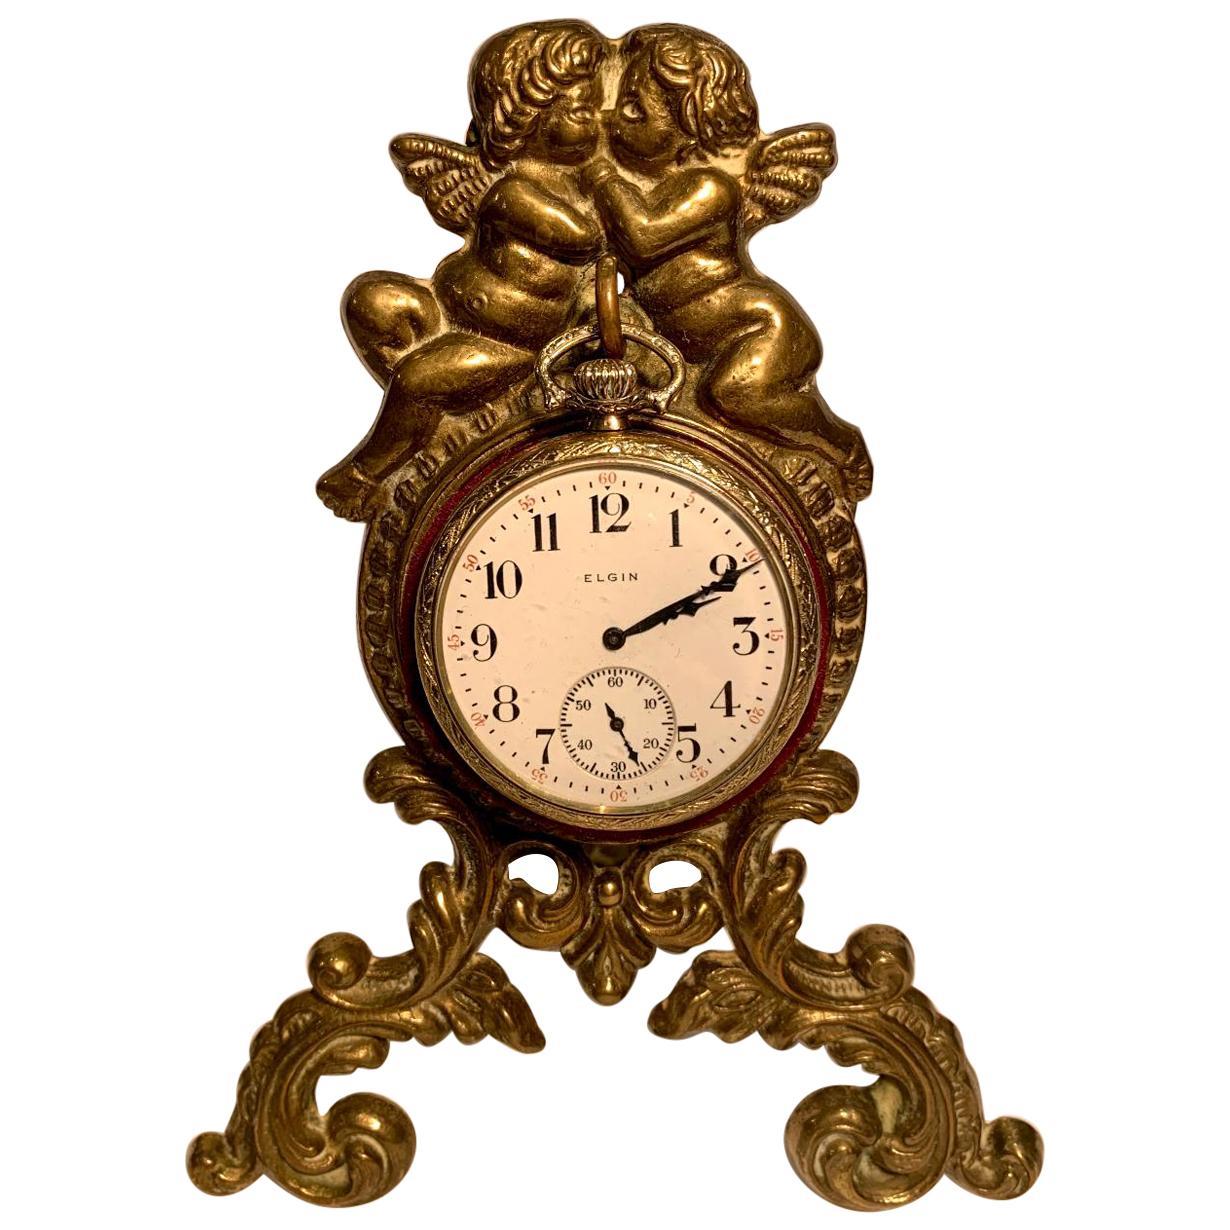 Beautiful Antique Loving Cherubs Gold Metal Pocket Watch Holder or Porte Montre